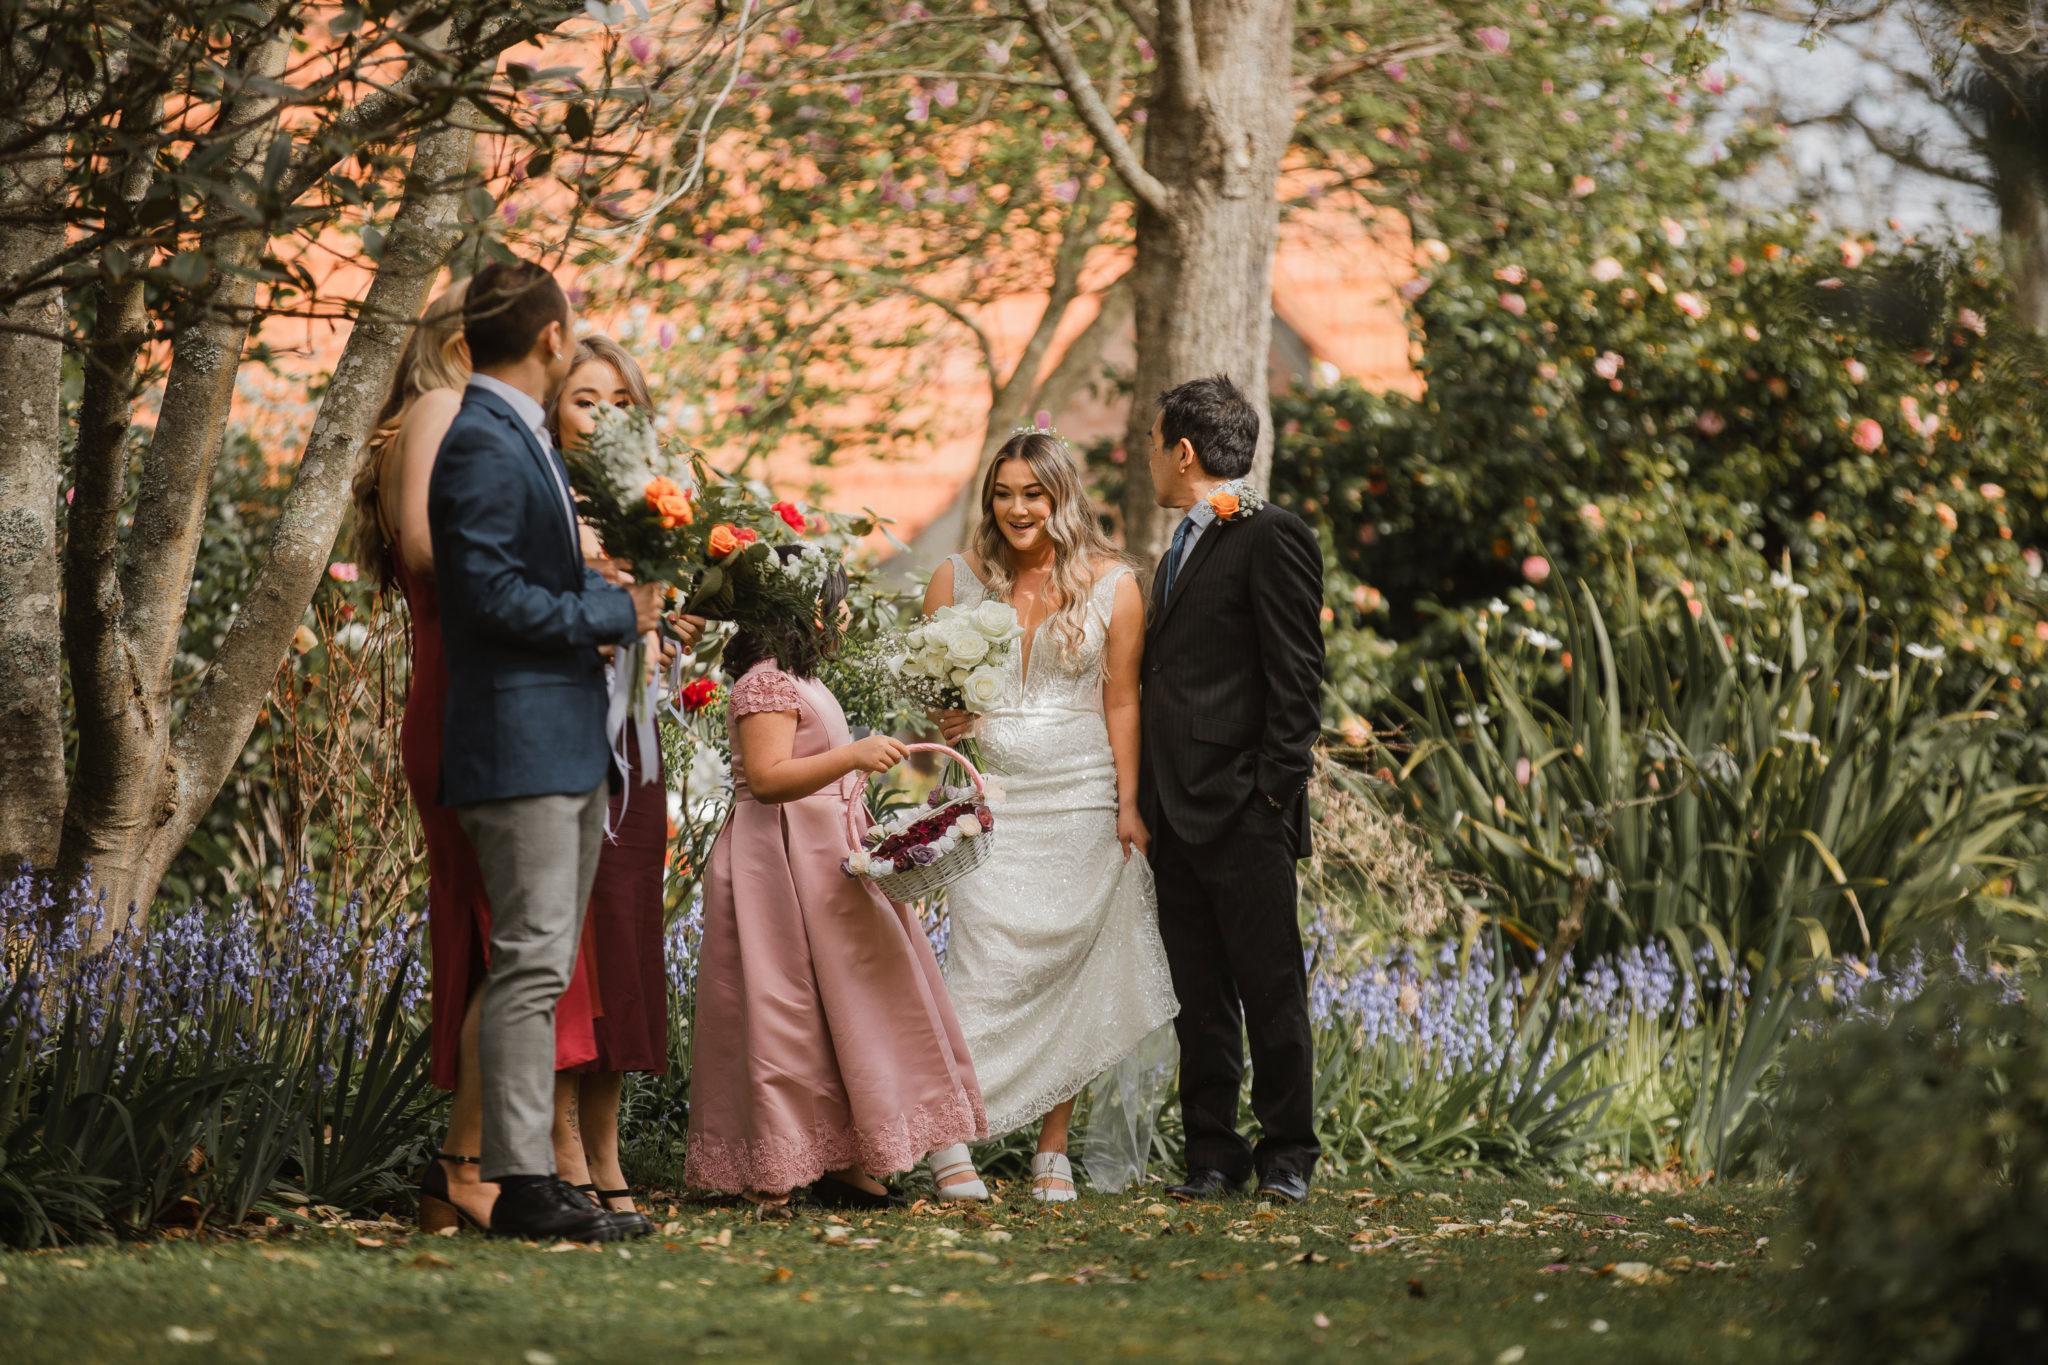 auckland bridal party arrive at wedding venue